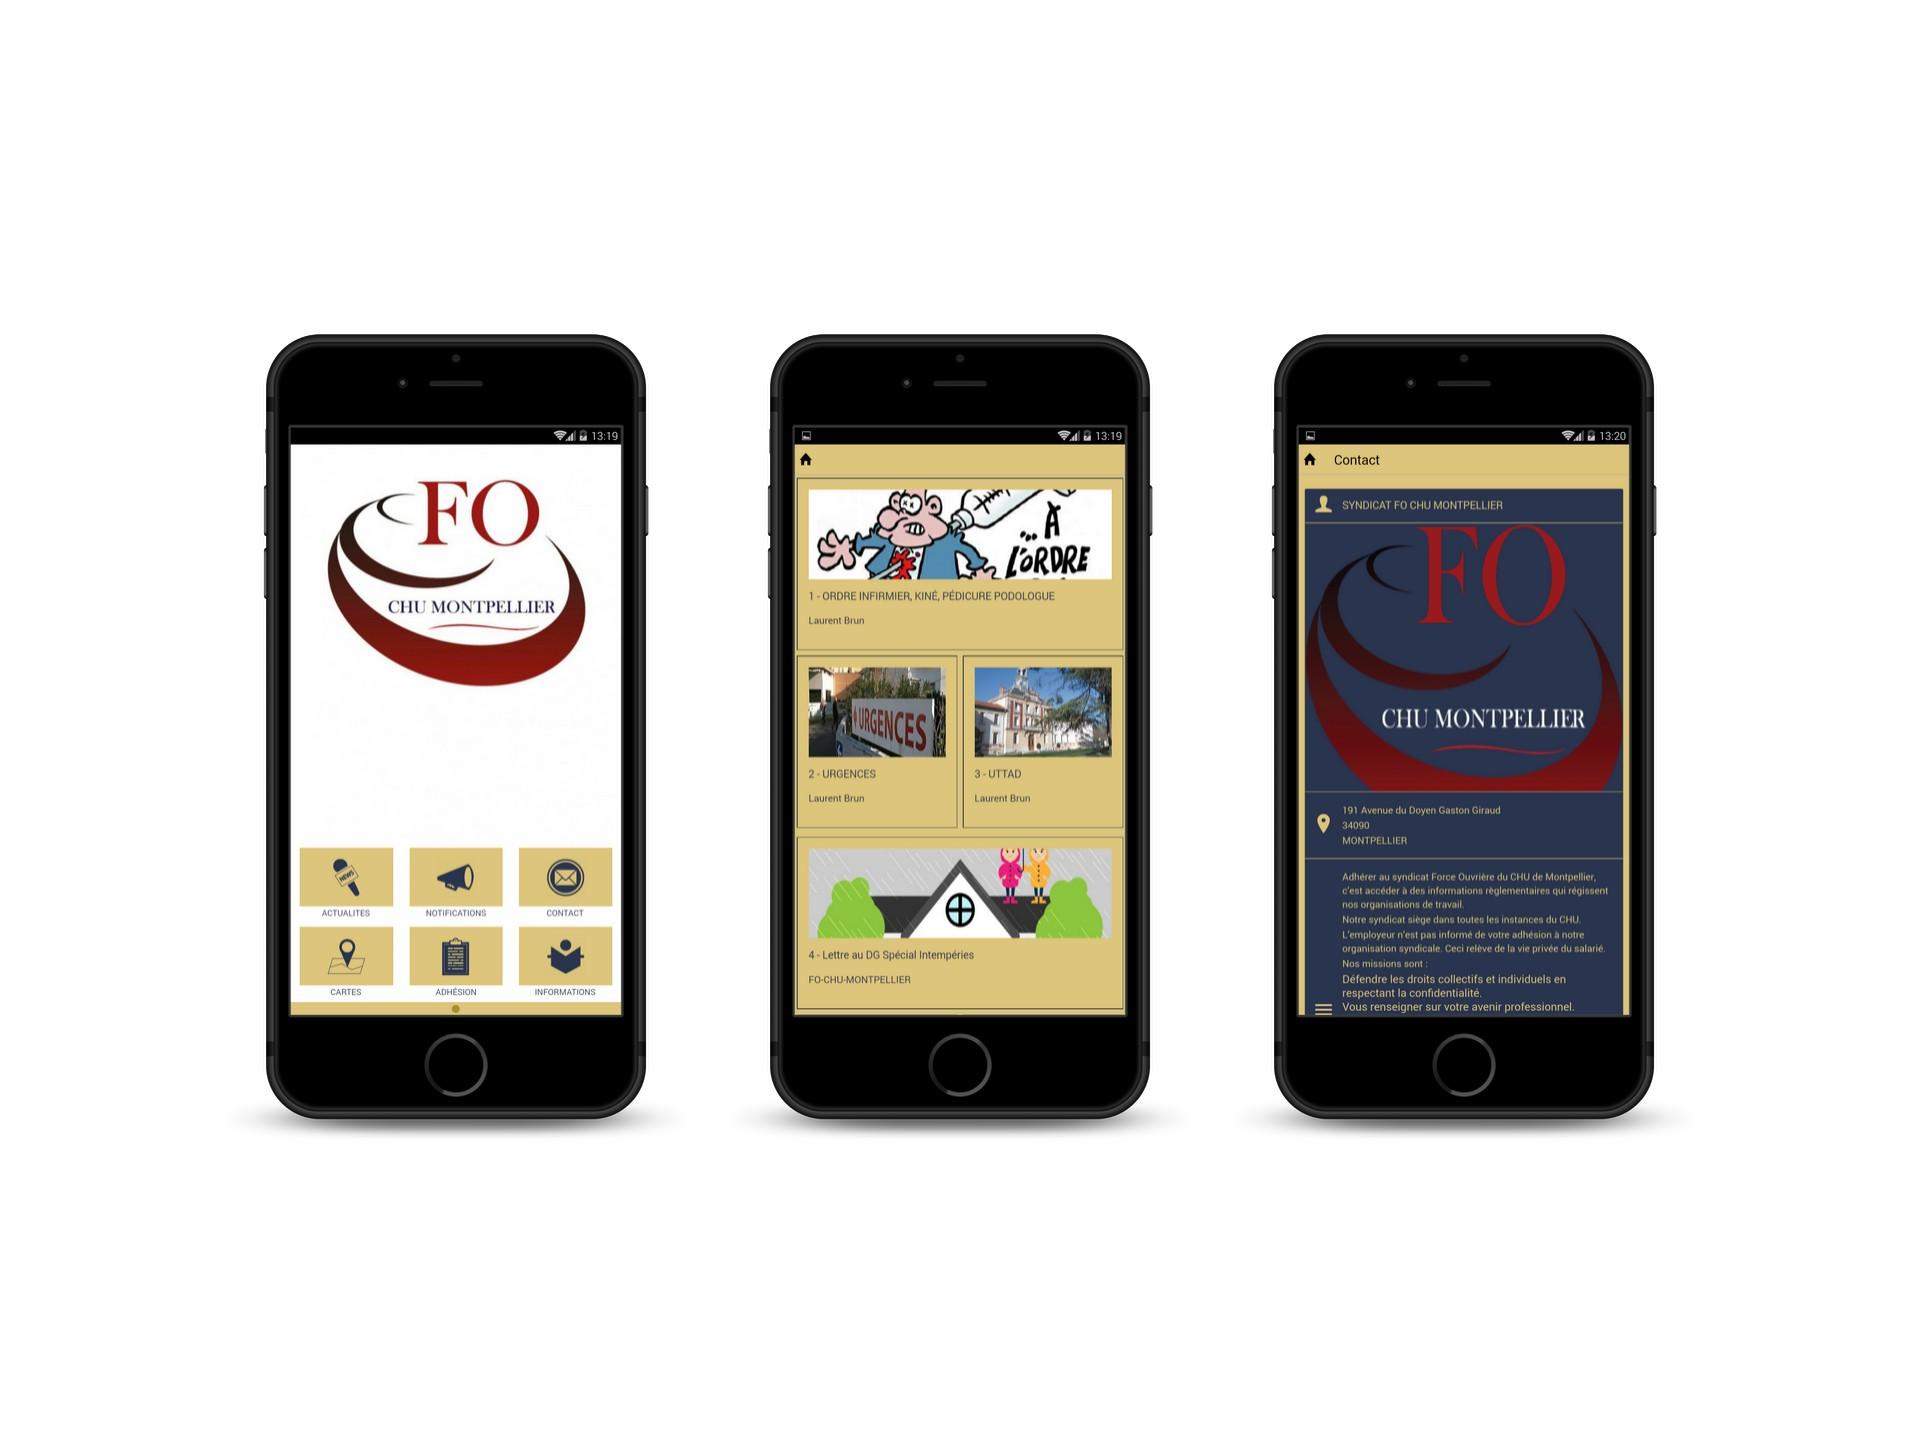 Mockup Smartphone Fo Chu Montpellier 2